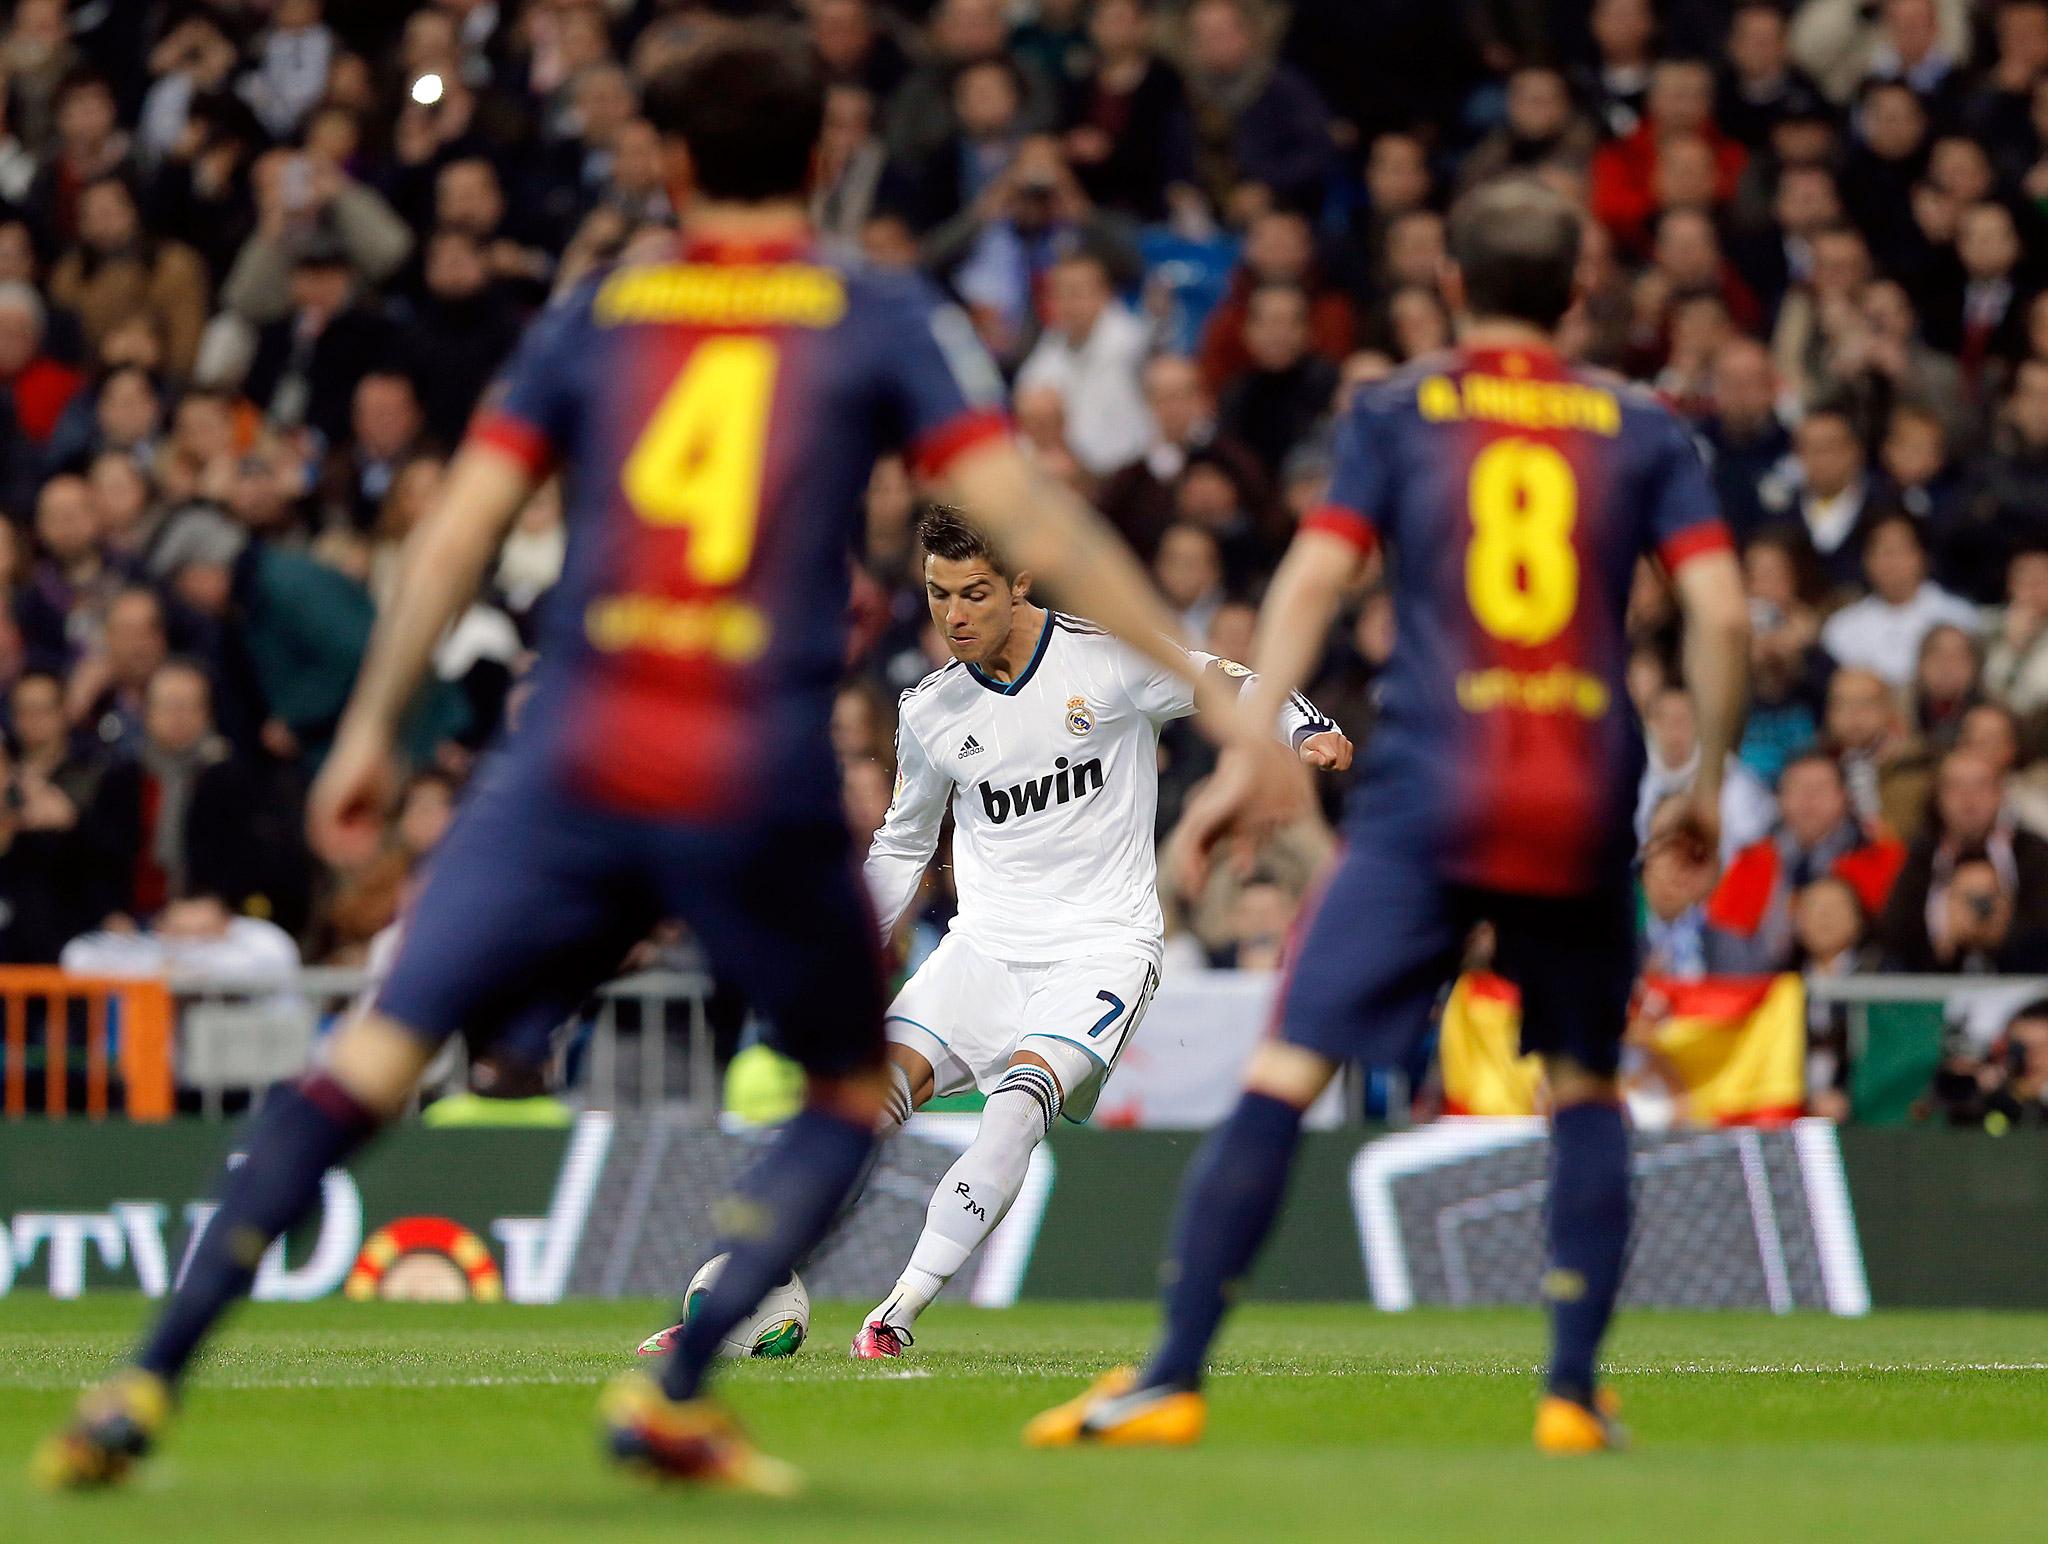 Ronaldo rollin'